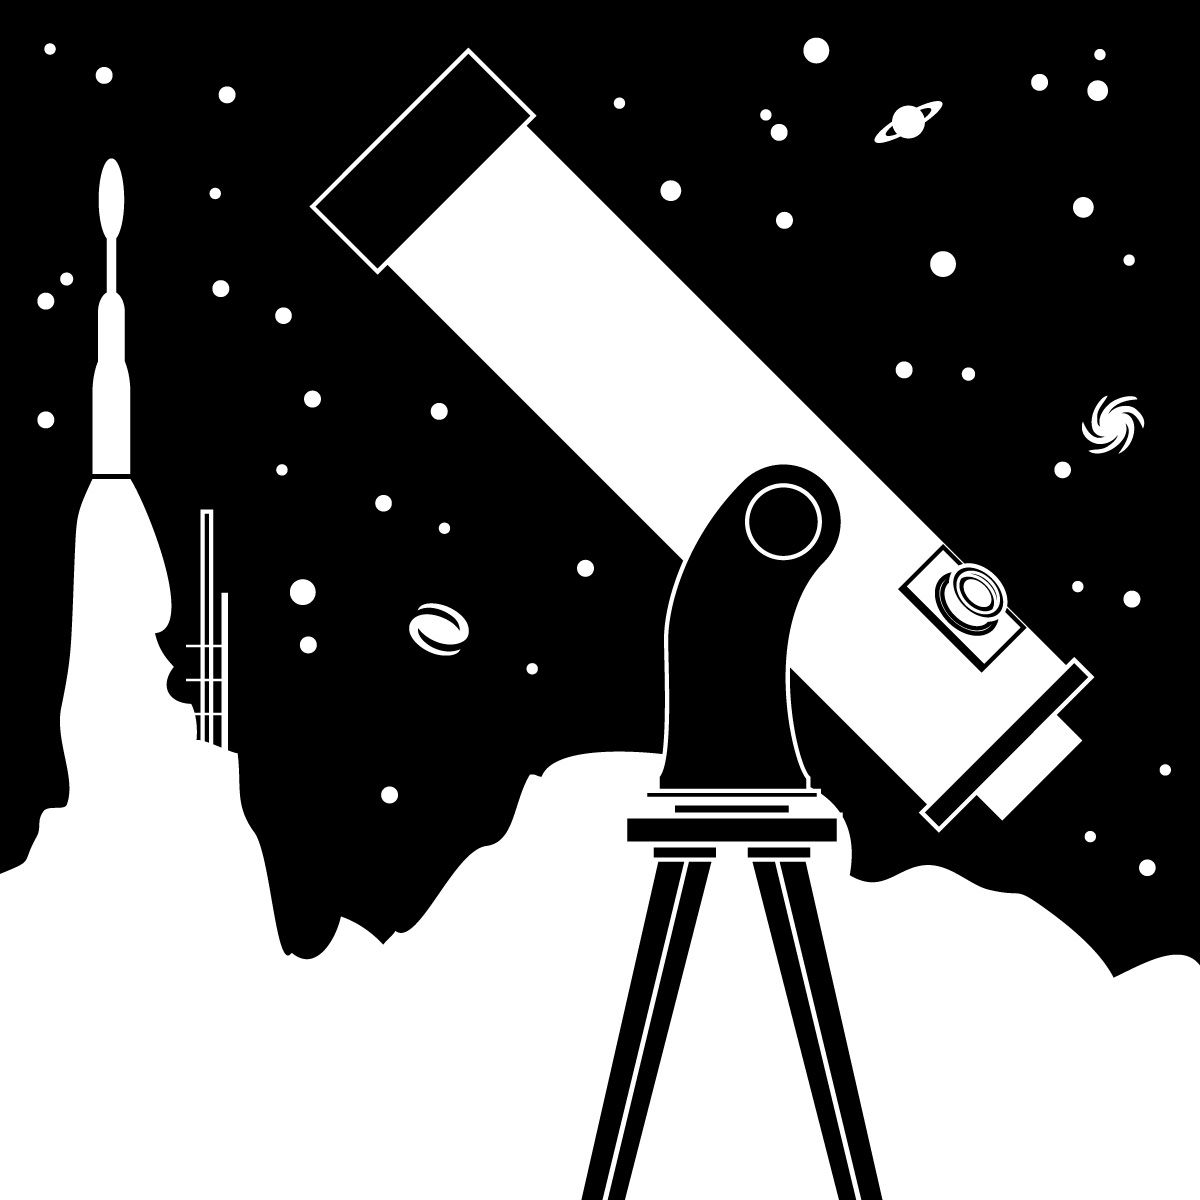 astronomy clipart science pinterest wacky holidays rh pinterest com Solar System Clip Art astronomy clipartof